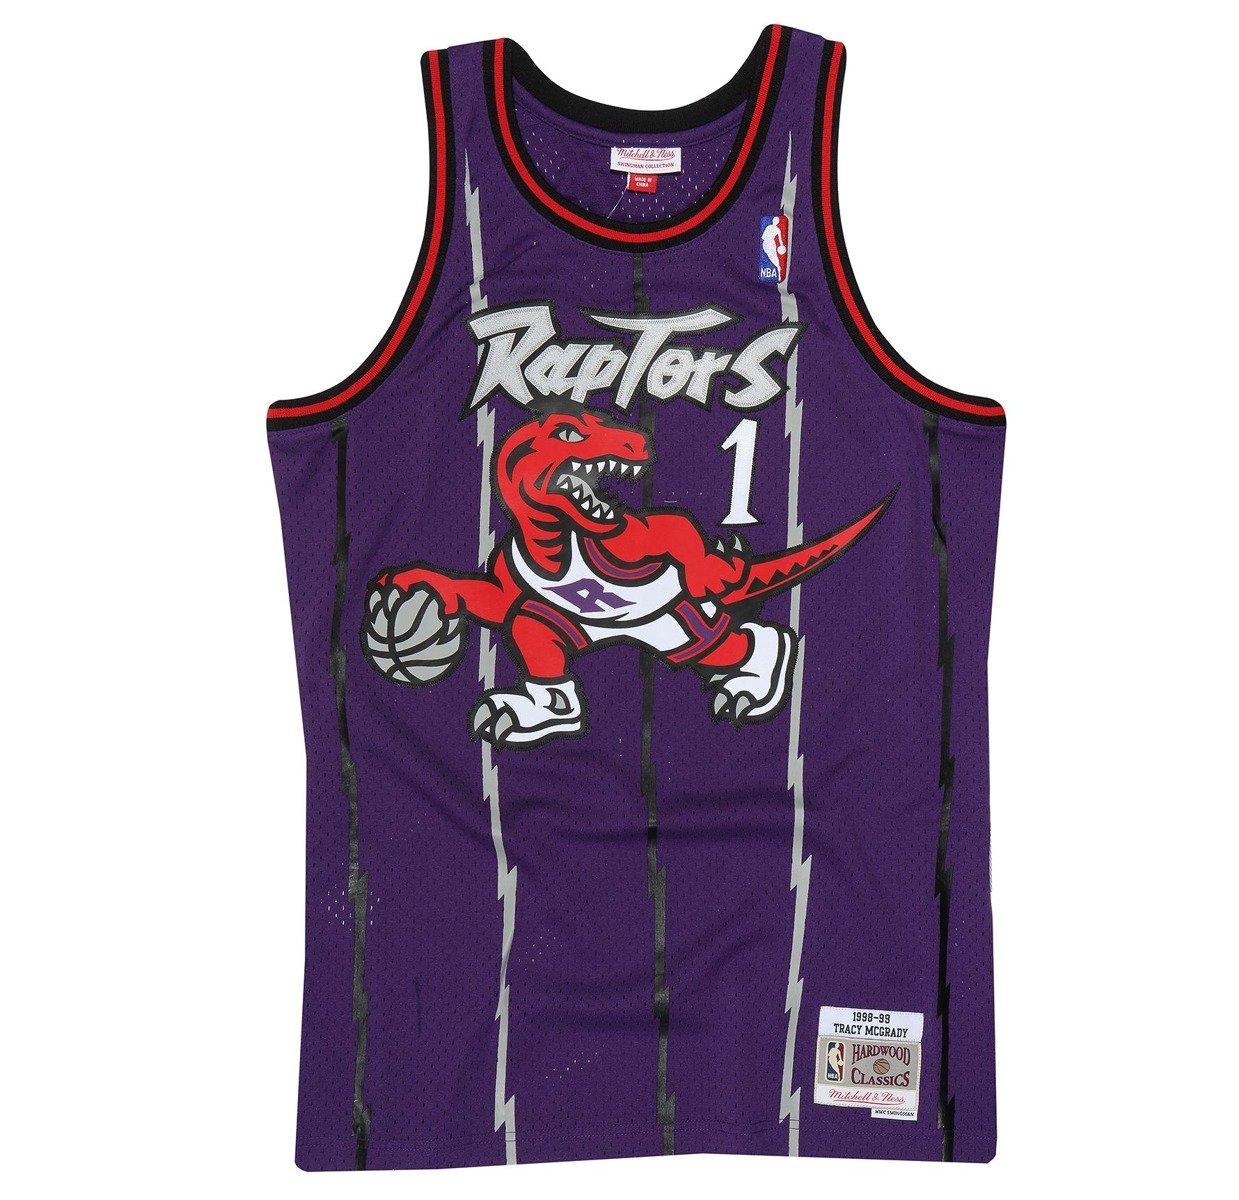 c063a2f4c Mitchell   Ness NBA Toronto Raptors Tracy McGrady Swingman Jersey ...